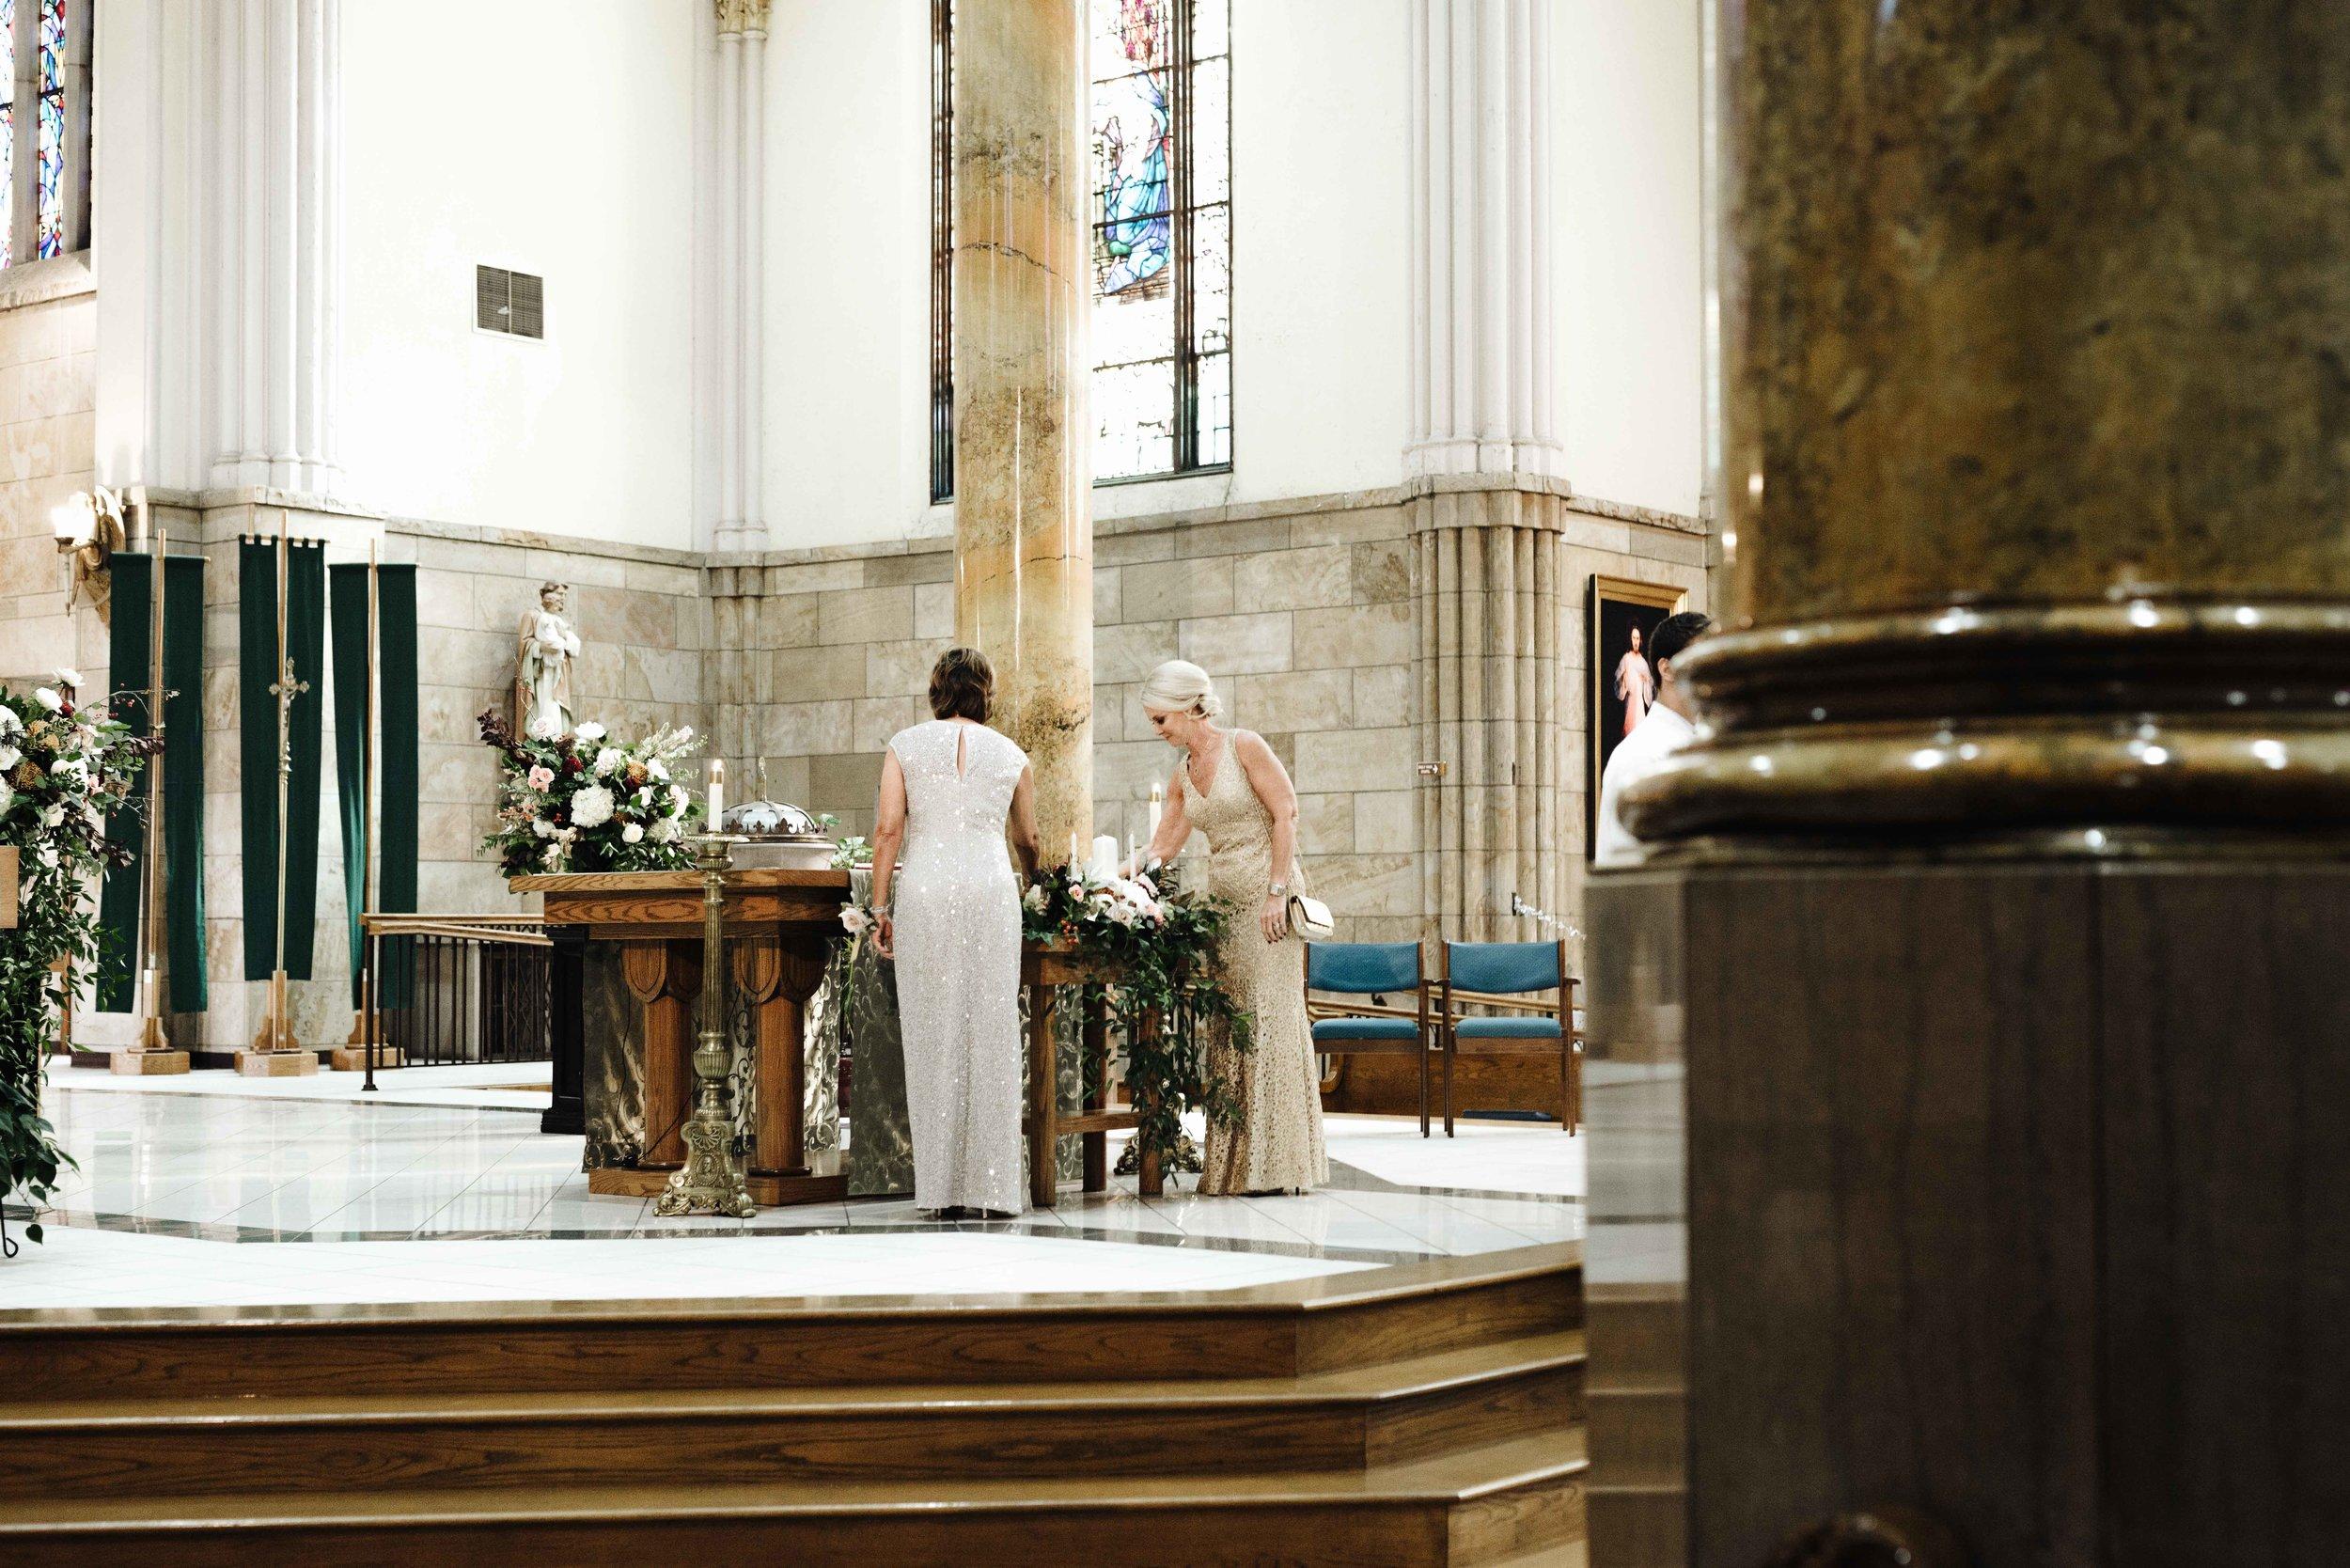 Carlee-Bob-Indianapolis-Wedding-Blog-48.jpg